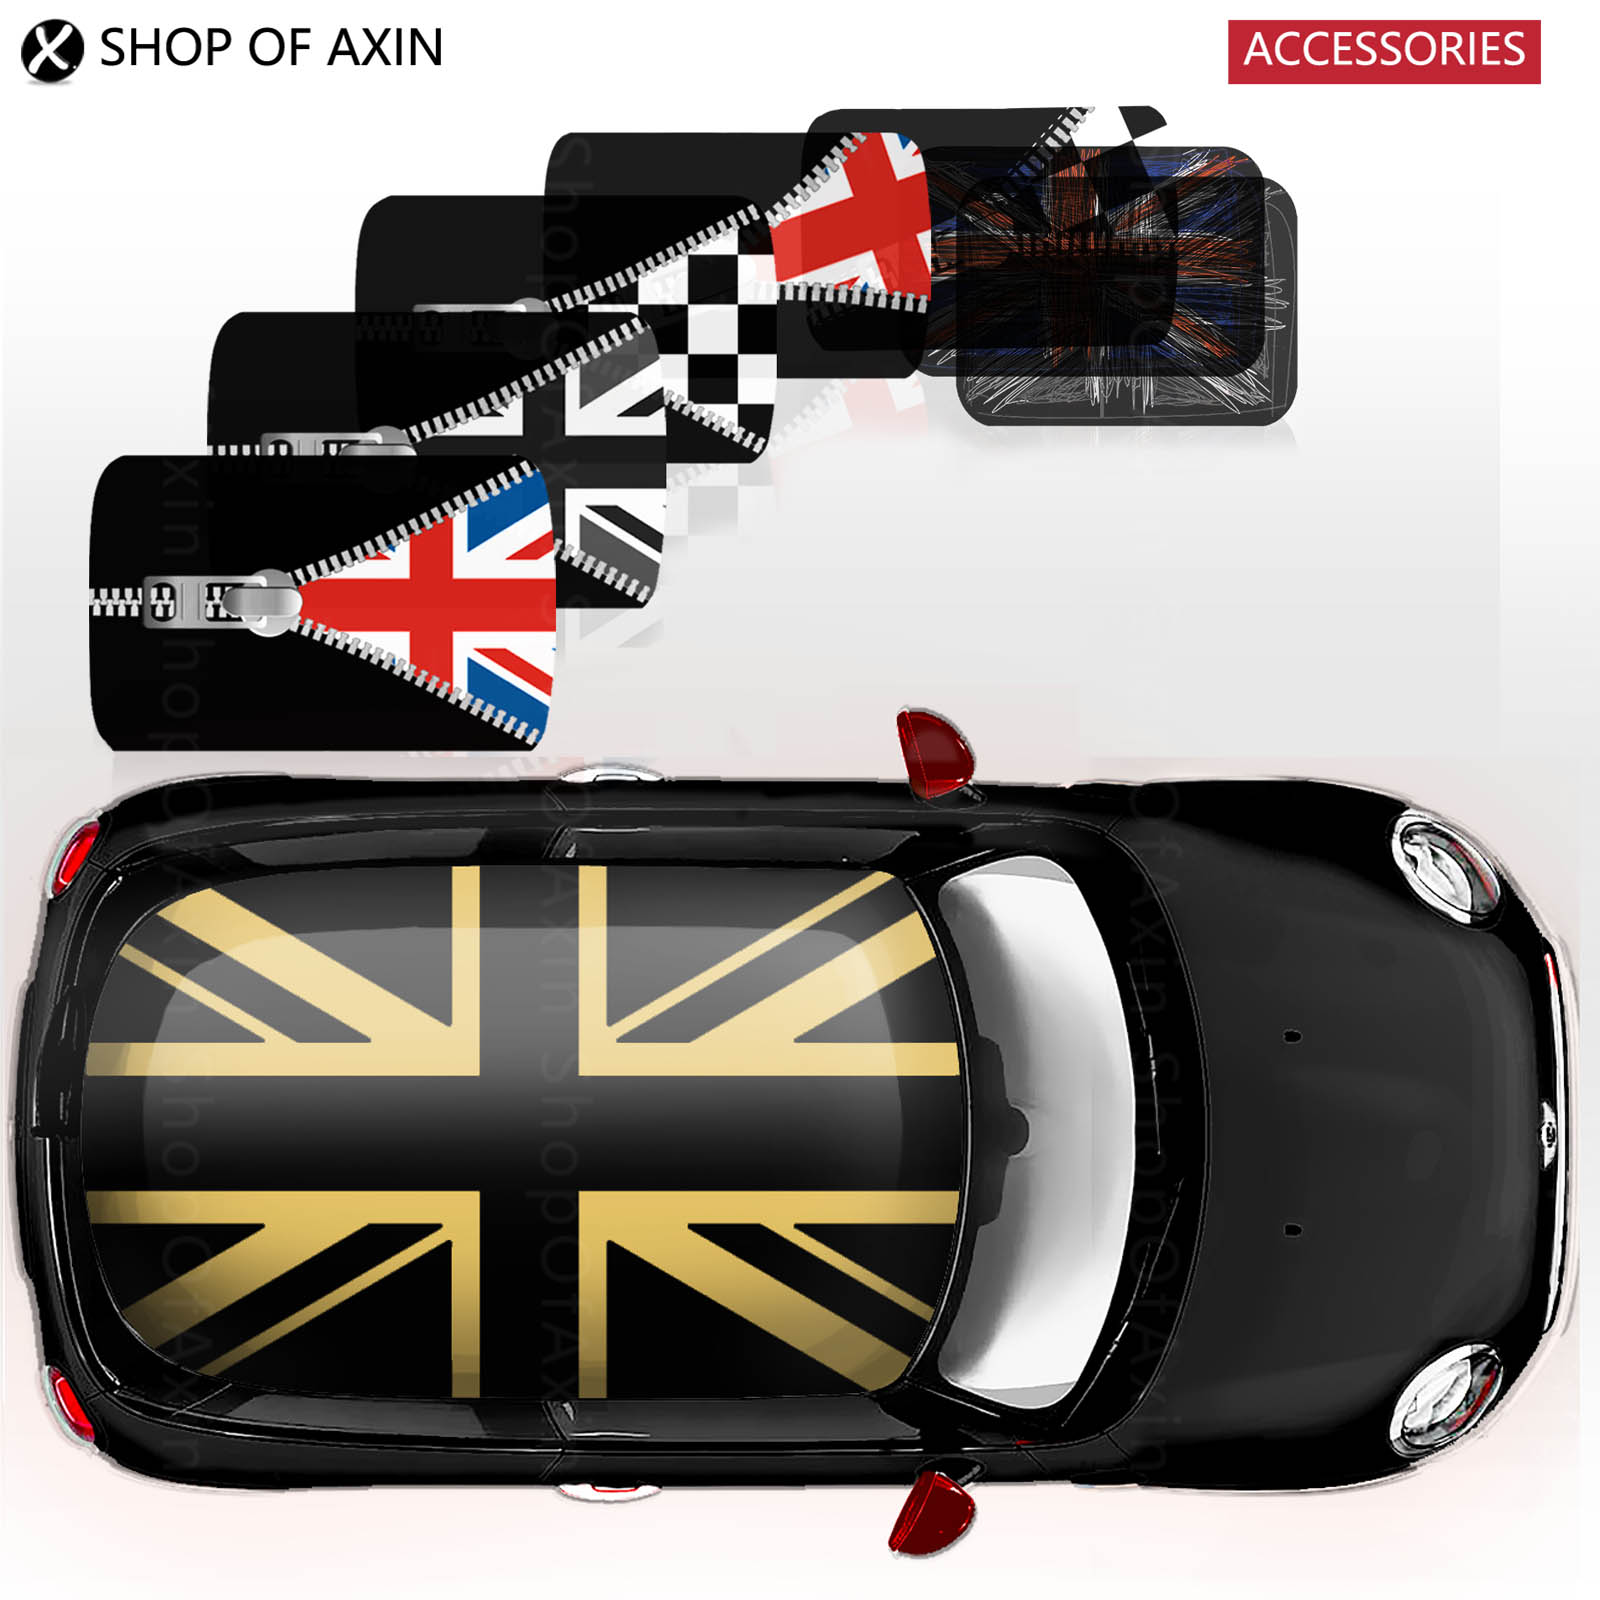 Kreative Voll Gesamte Abdeckung Dach Graphics Aufkleber Aufkleber Für Mini Cooper Clubman Ryman Hardtop R50 R53 R55 R56 R60 F55 F56